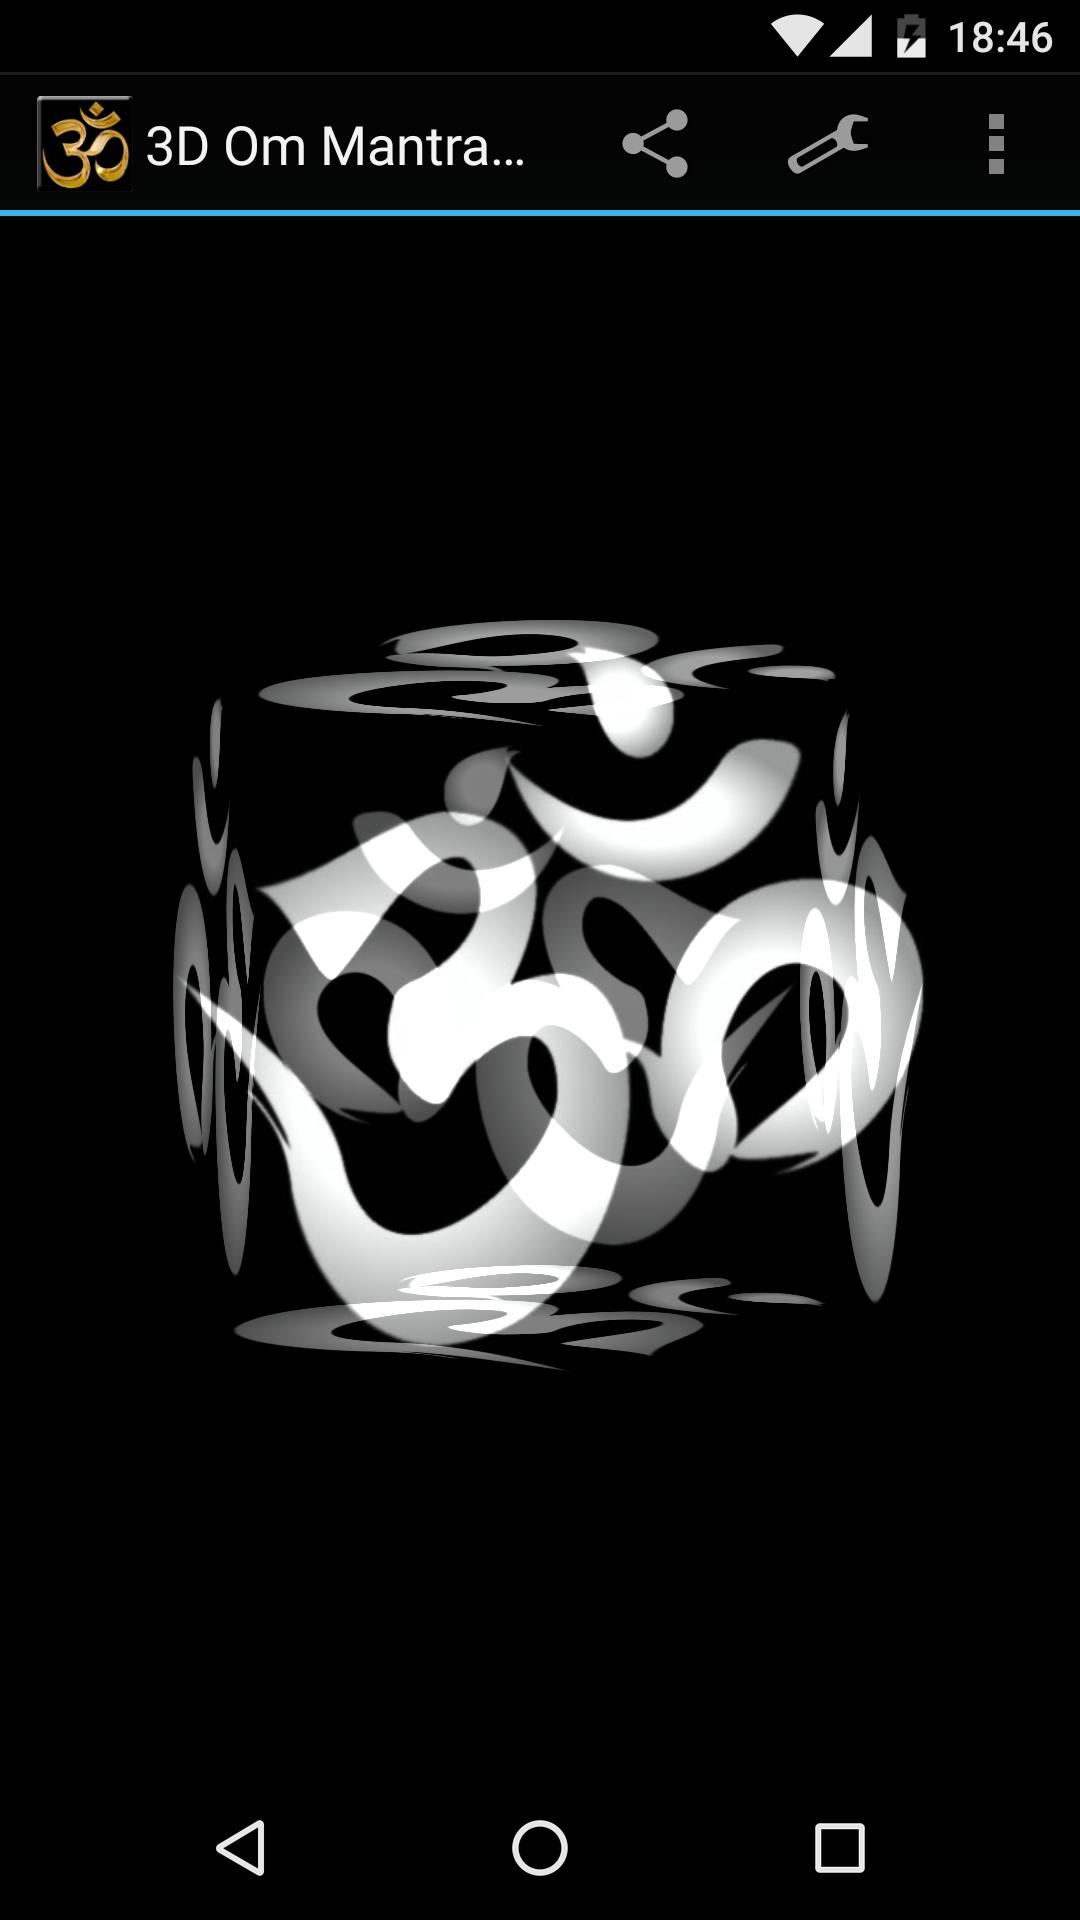 3D Om Mantra Live Wallpaper: Amazon.es: Appstore para Android